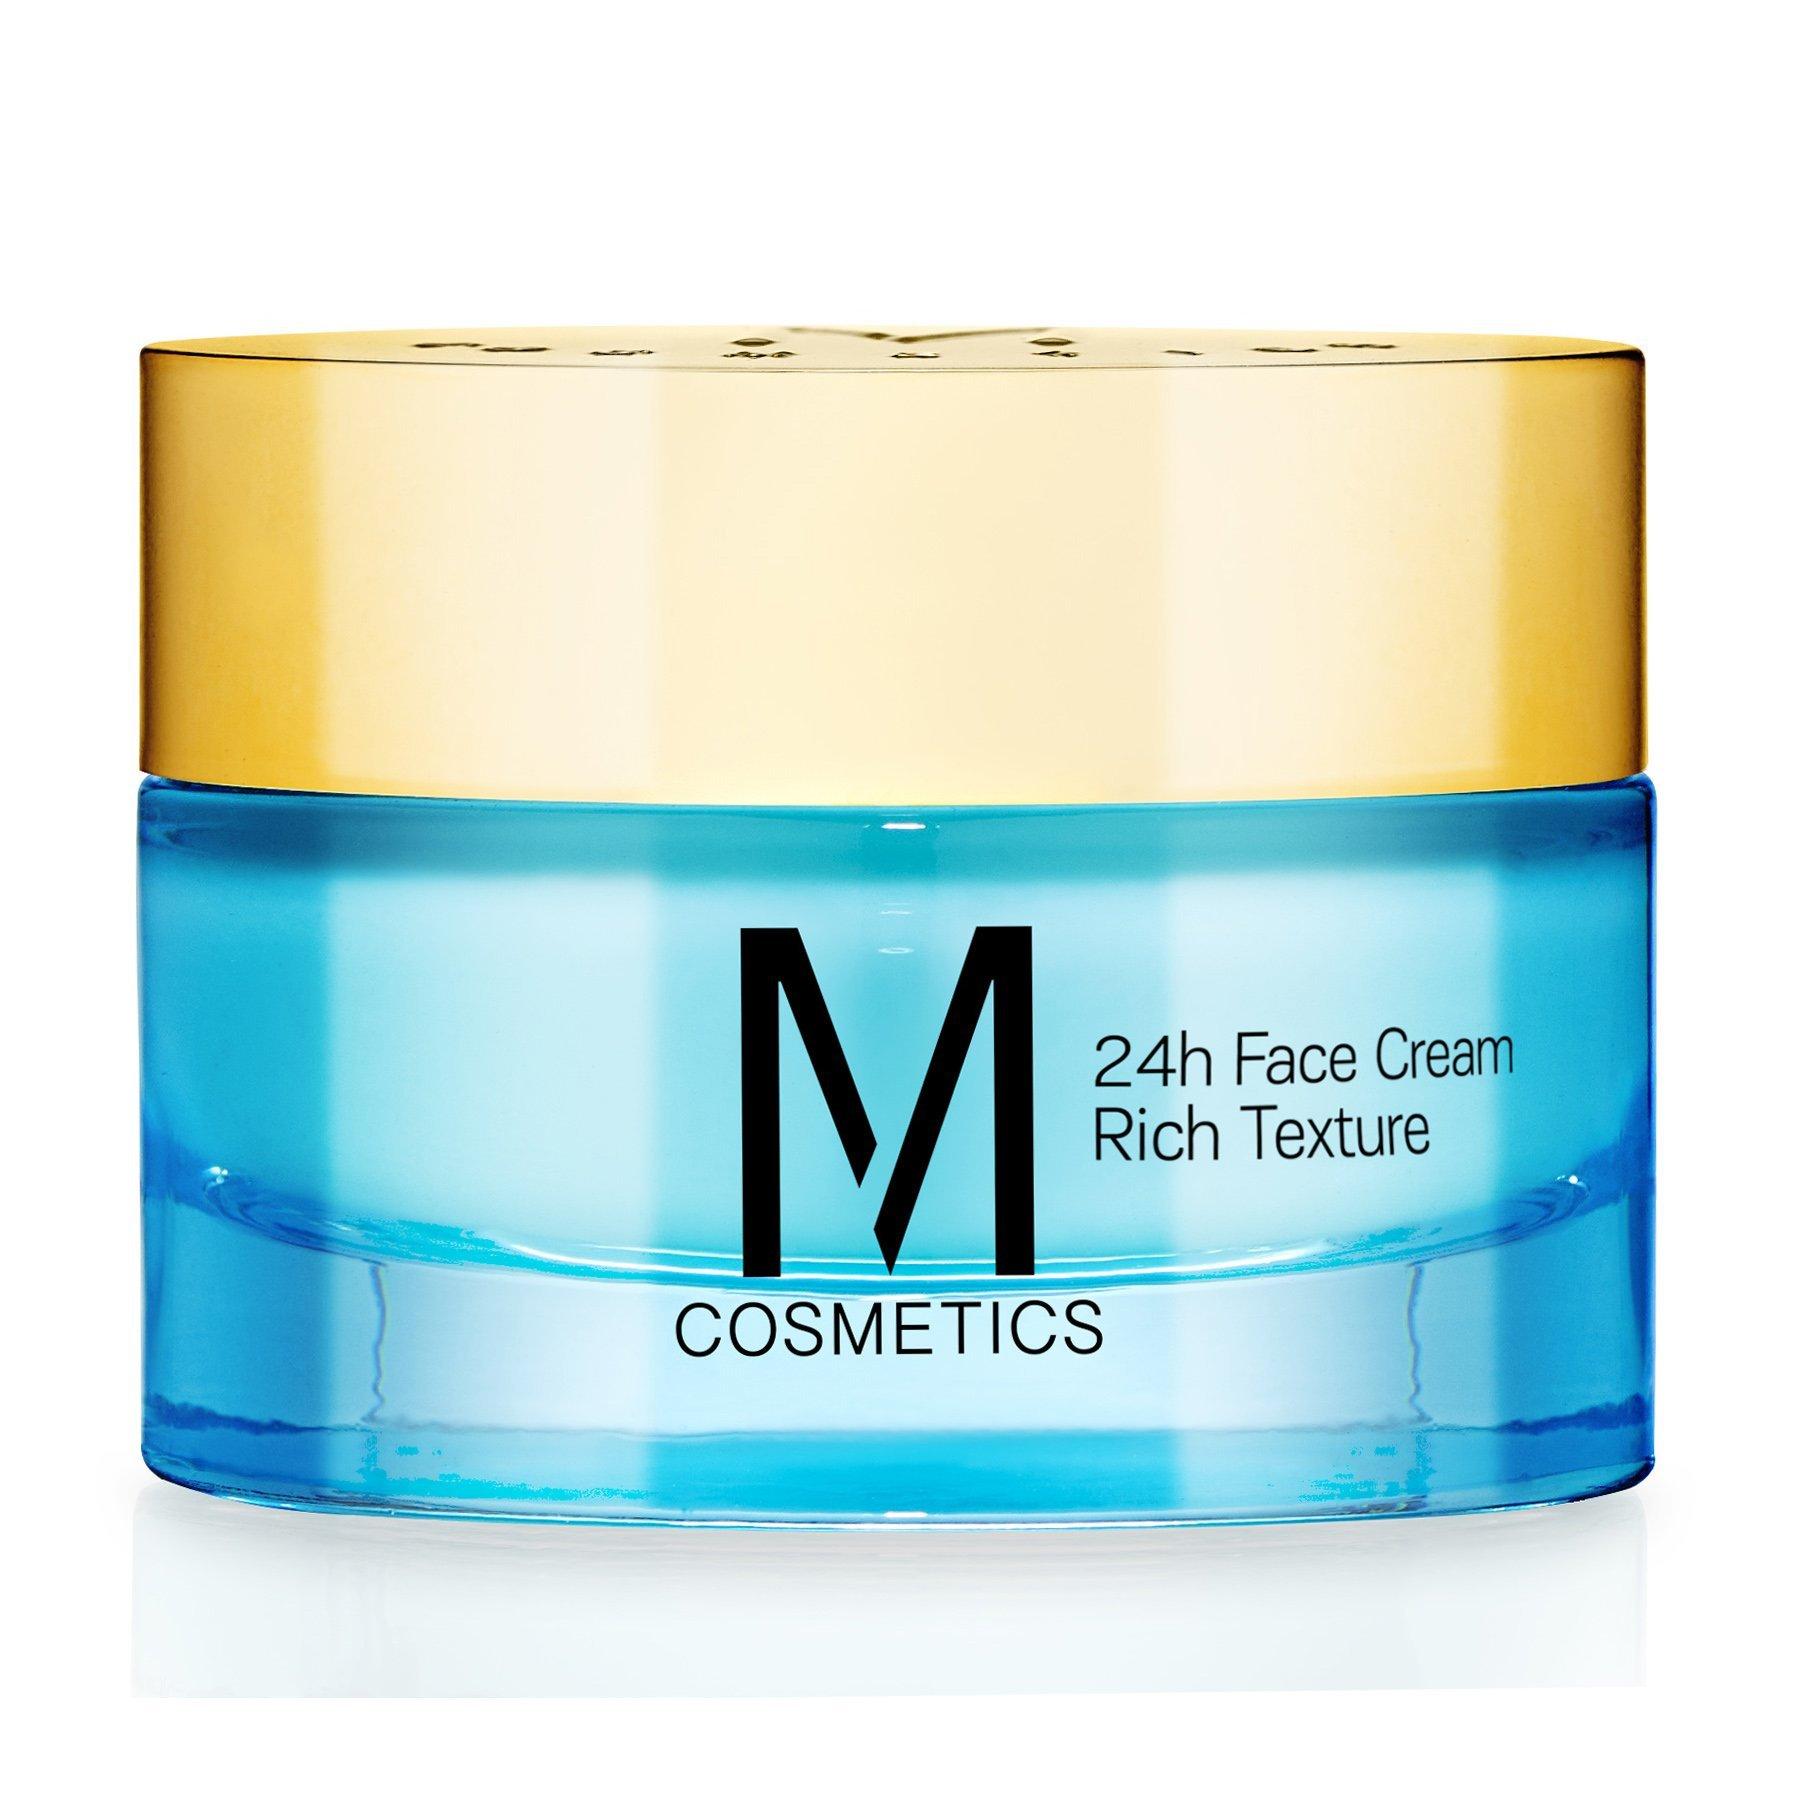 M Cosmetis 24h Face Cream Rich Texture 24ωρη Κρέμα Προσώπου Πλούσιας Υφής με Ολοκληρωμένη Αντιρυτιδική & Συσφικτική Δράση 50ml